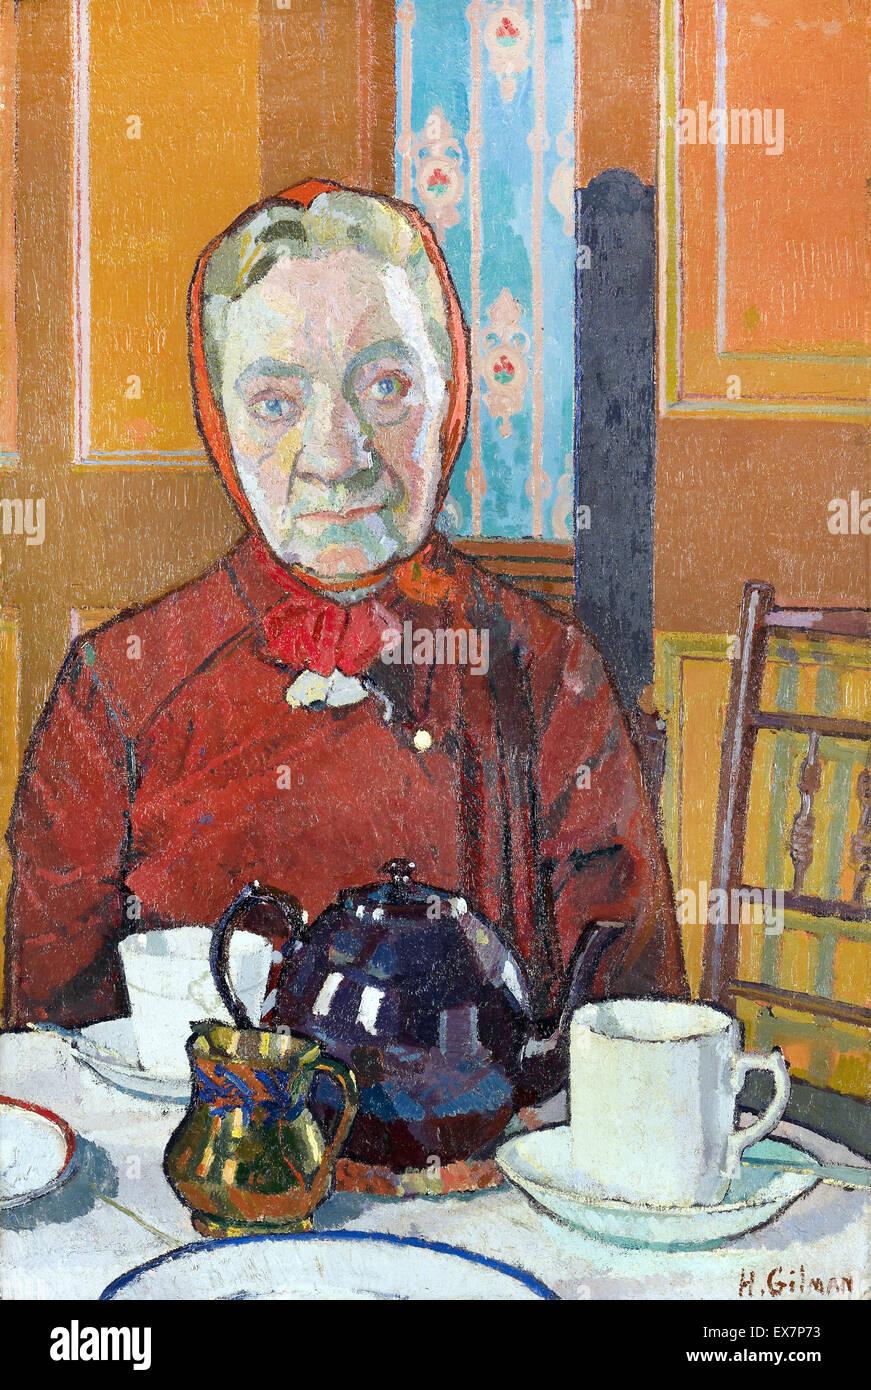 Harold Gilman, Onorevole Mounter 1916 olio su tela. La Walker Art Gallery di Liverpool, in Inghilterra. Immagini Stock